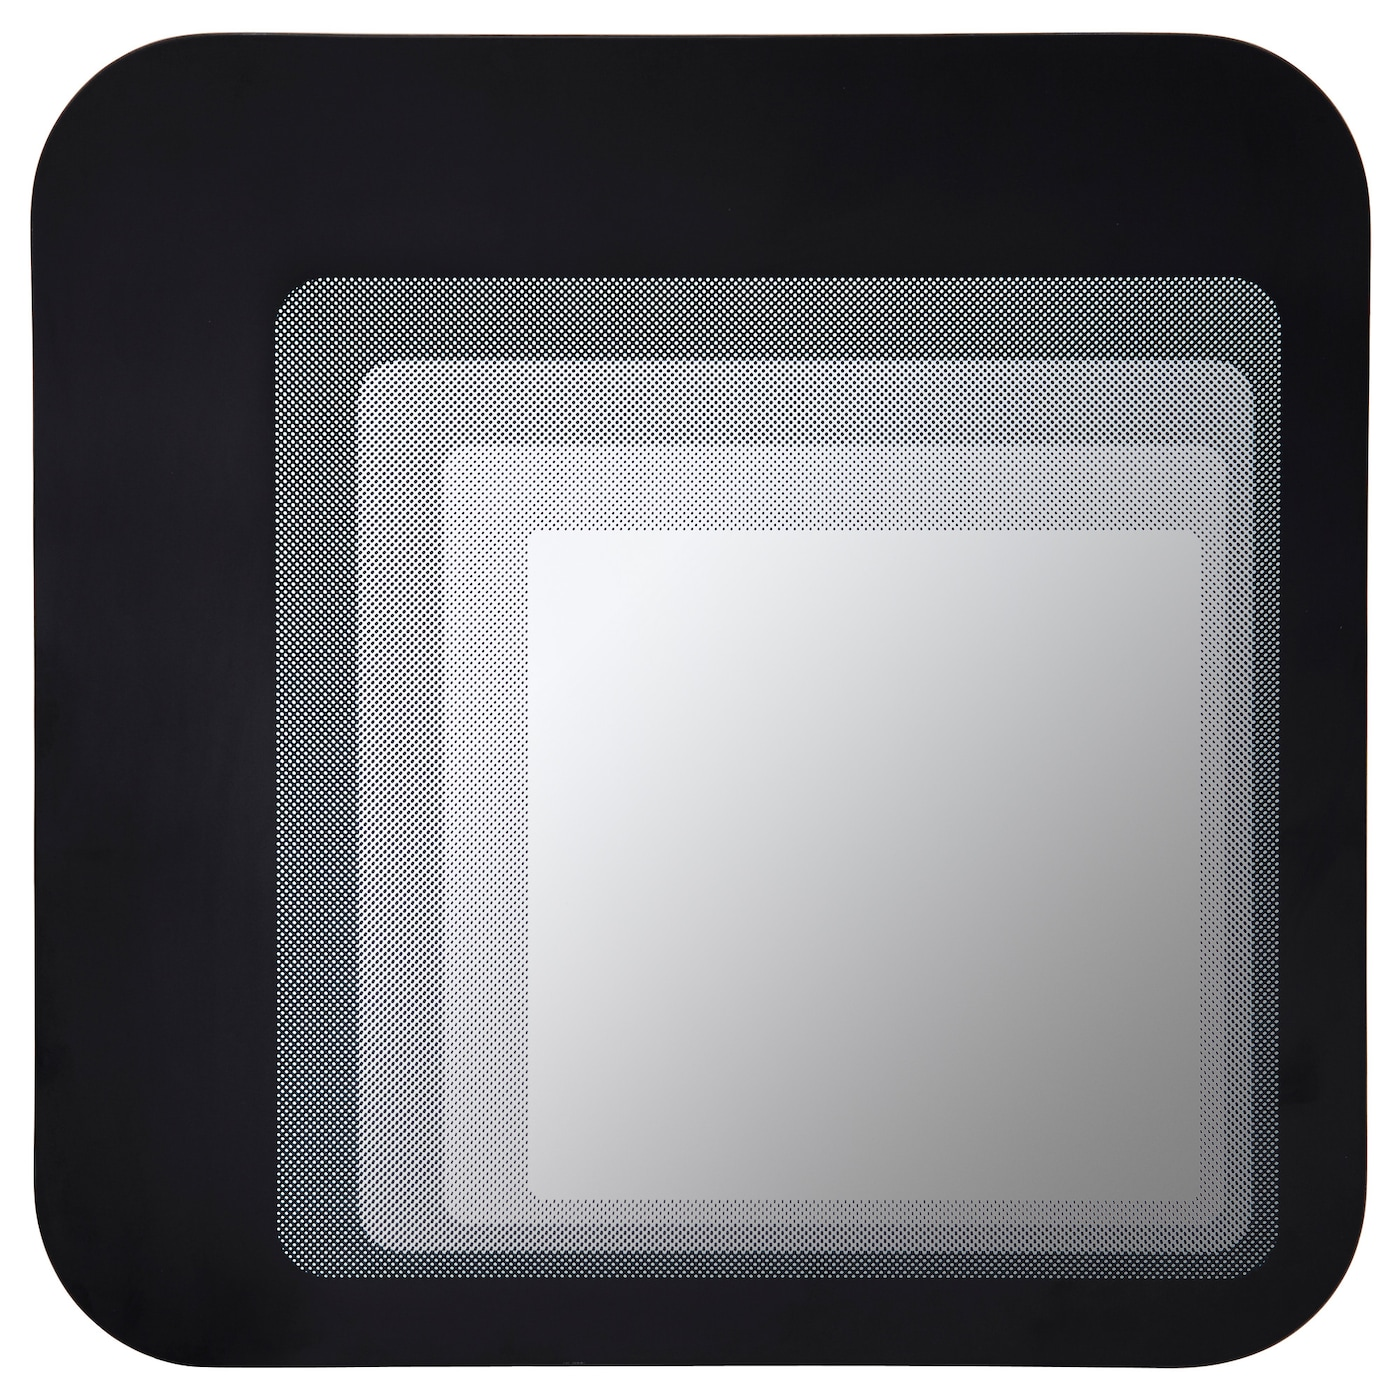 spiegel archive tipps vom einrichter. Black Bedroom Furniture Sets. Home Design Ideas